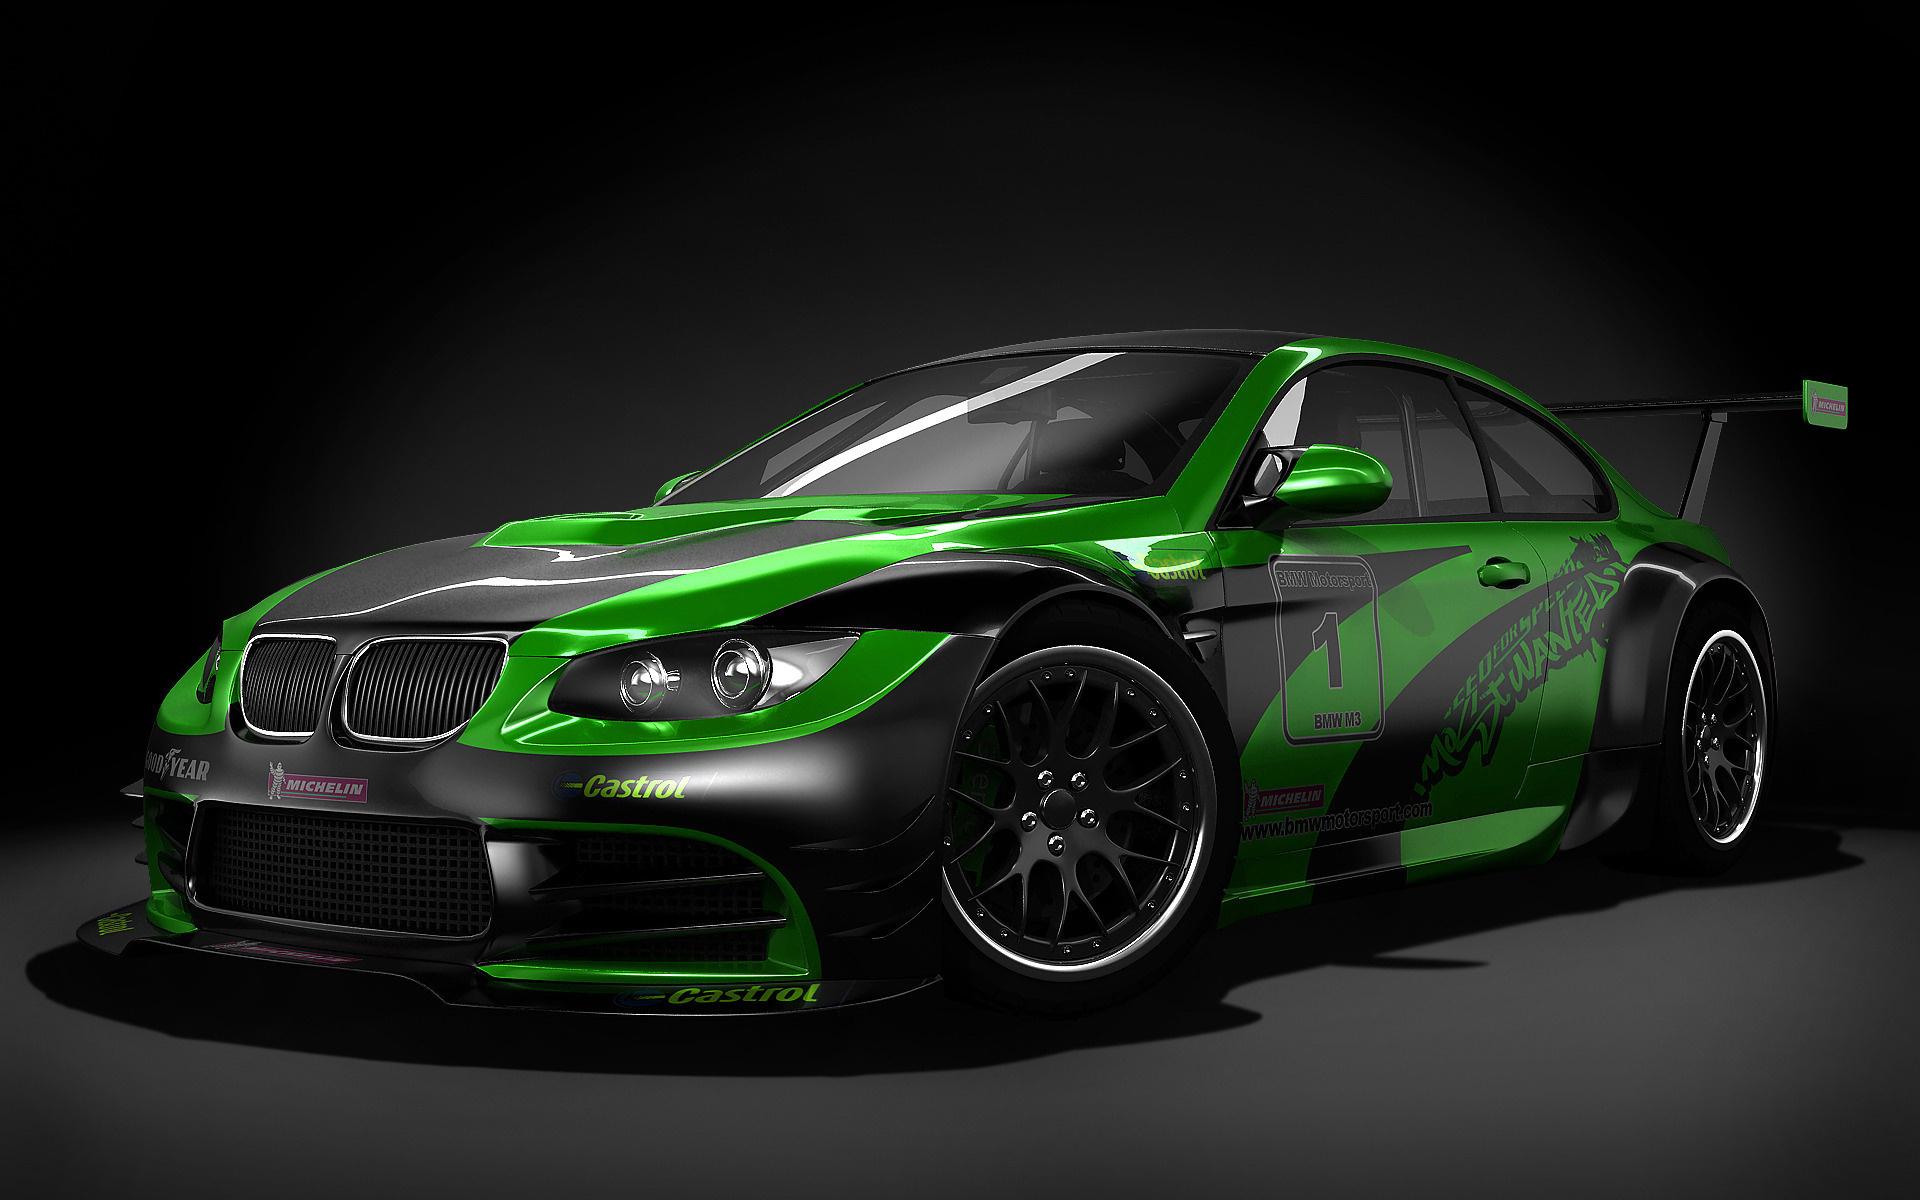 Green Car Wallpaper 32622 1920x1200 px